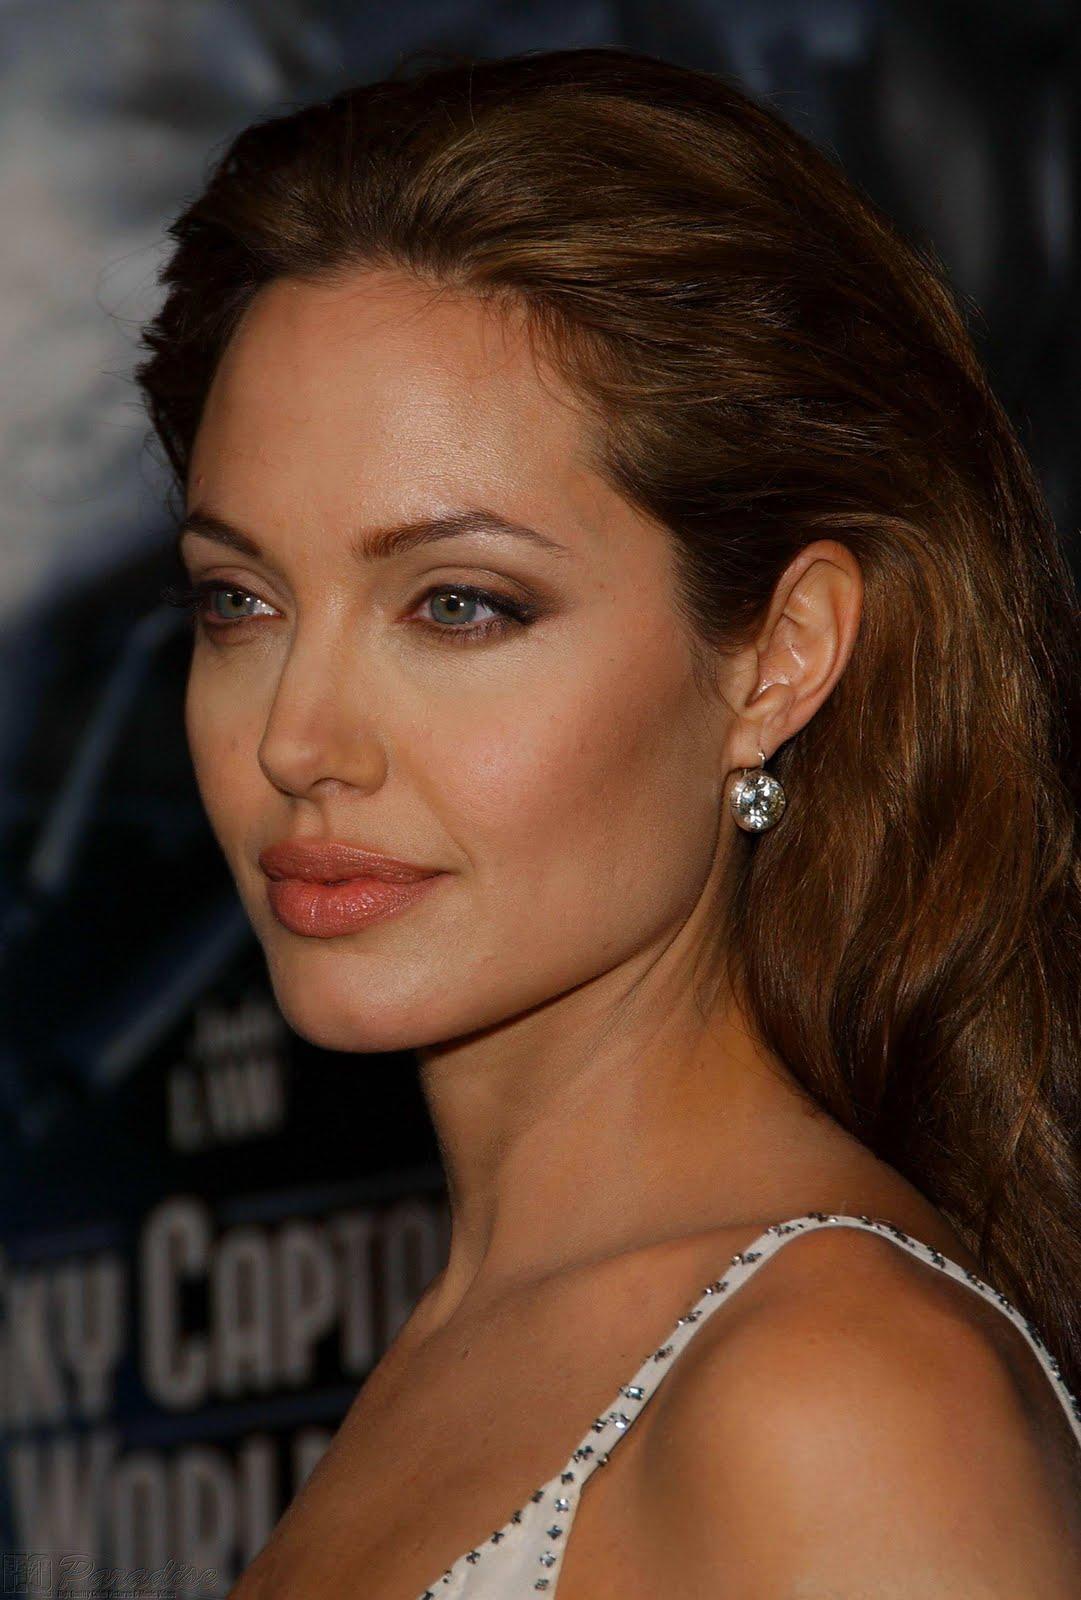 http://1.bp.blogspot.com/-RgwKzvLKrB8/TaAquwuSUoI/AAAAAAAAJfc/kjcV0_Ujzas/s1600/Angelina-Jolie-Picture-009.jpg